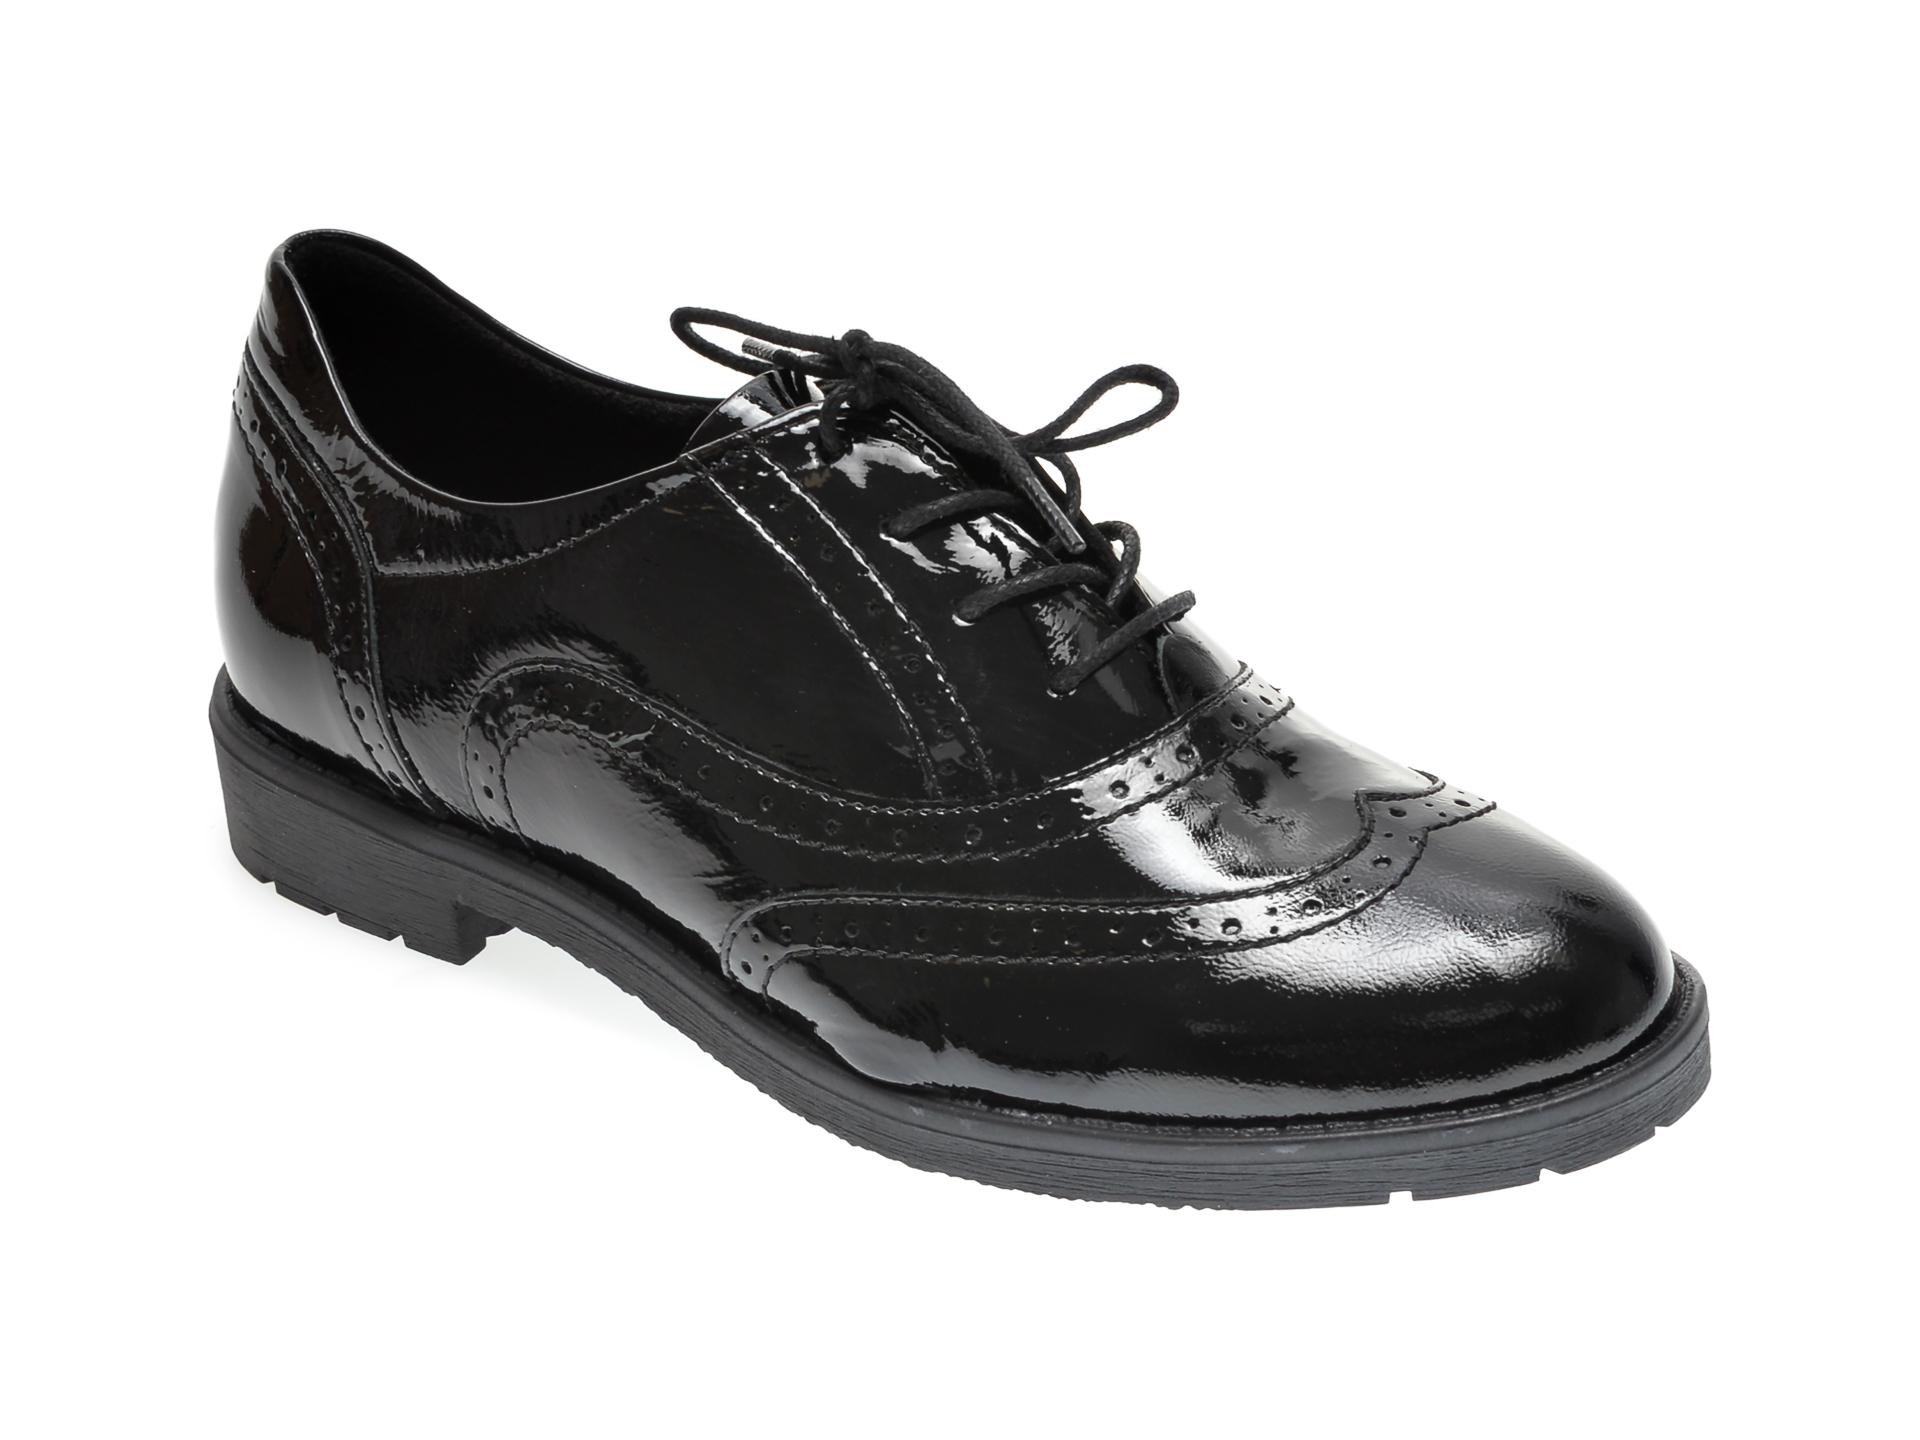 Pantofi ILOZ negri, 1050, din piele naturala lacuita imagine